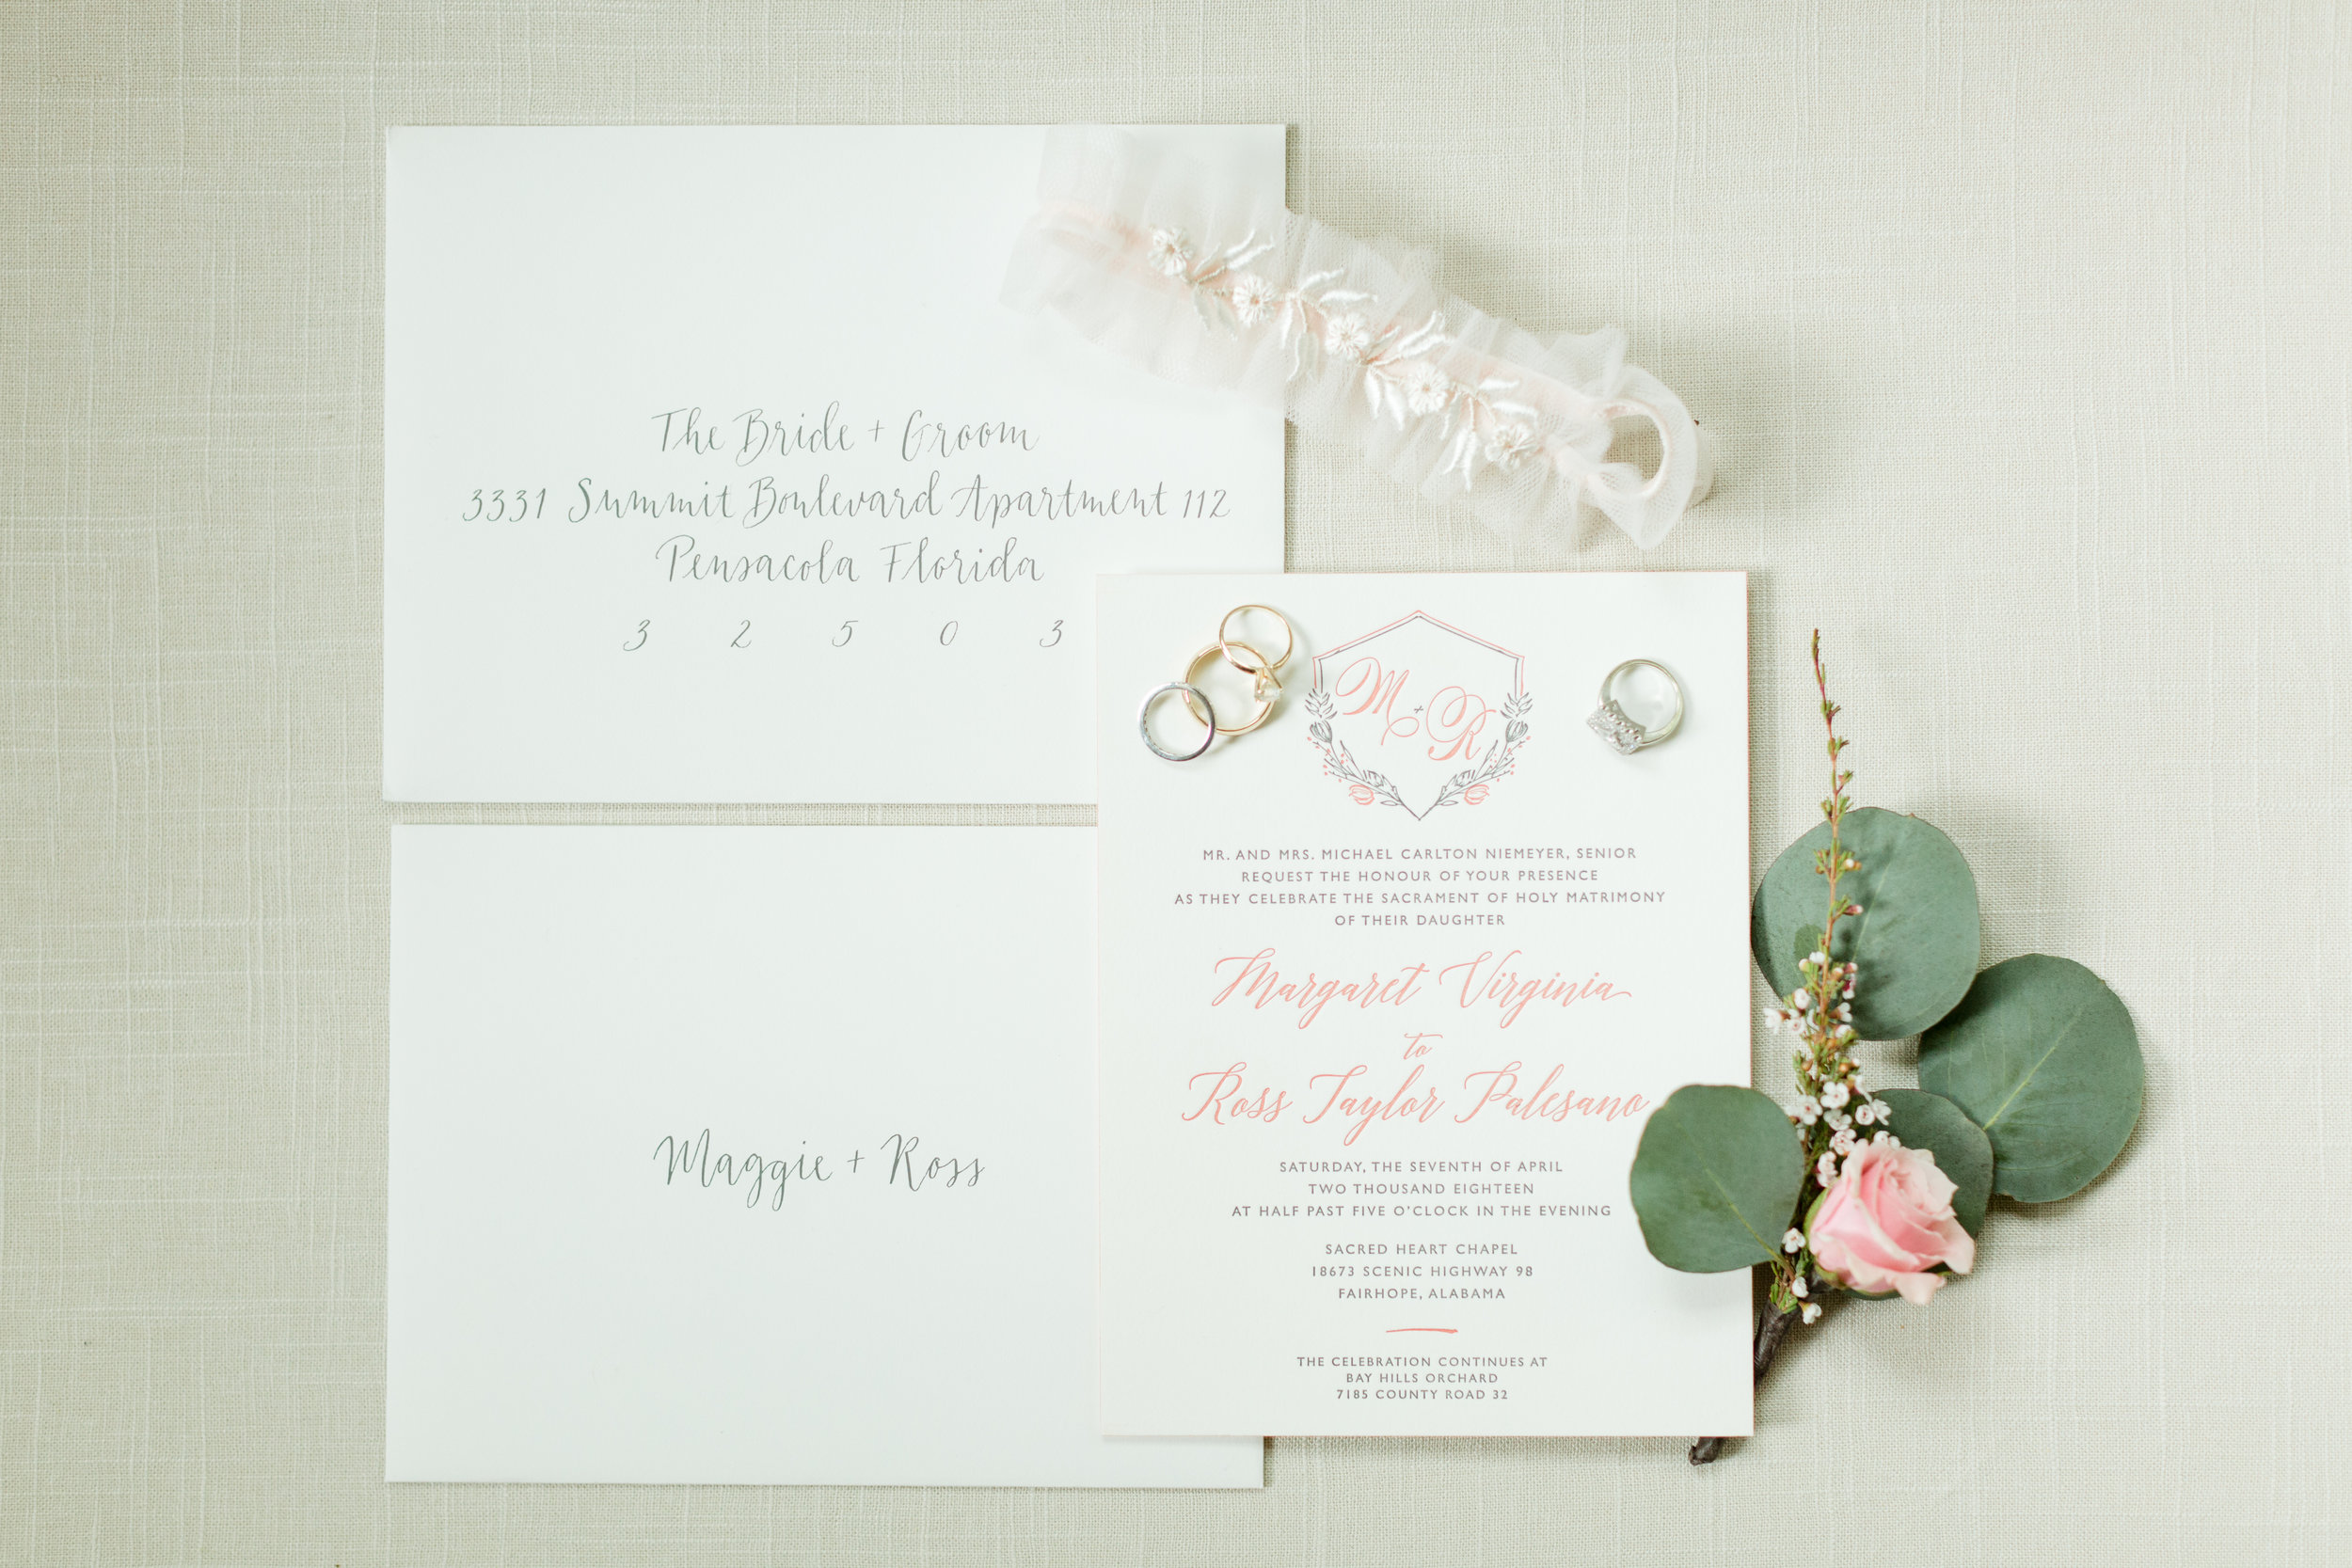 0031-EGP-2018-Palesano-Wedding-22367.jpg